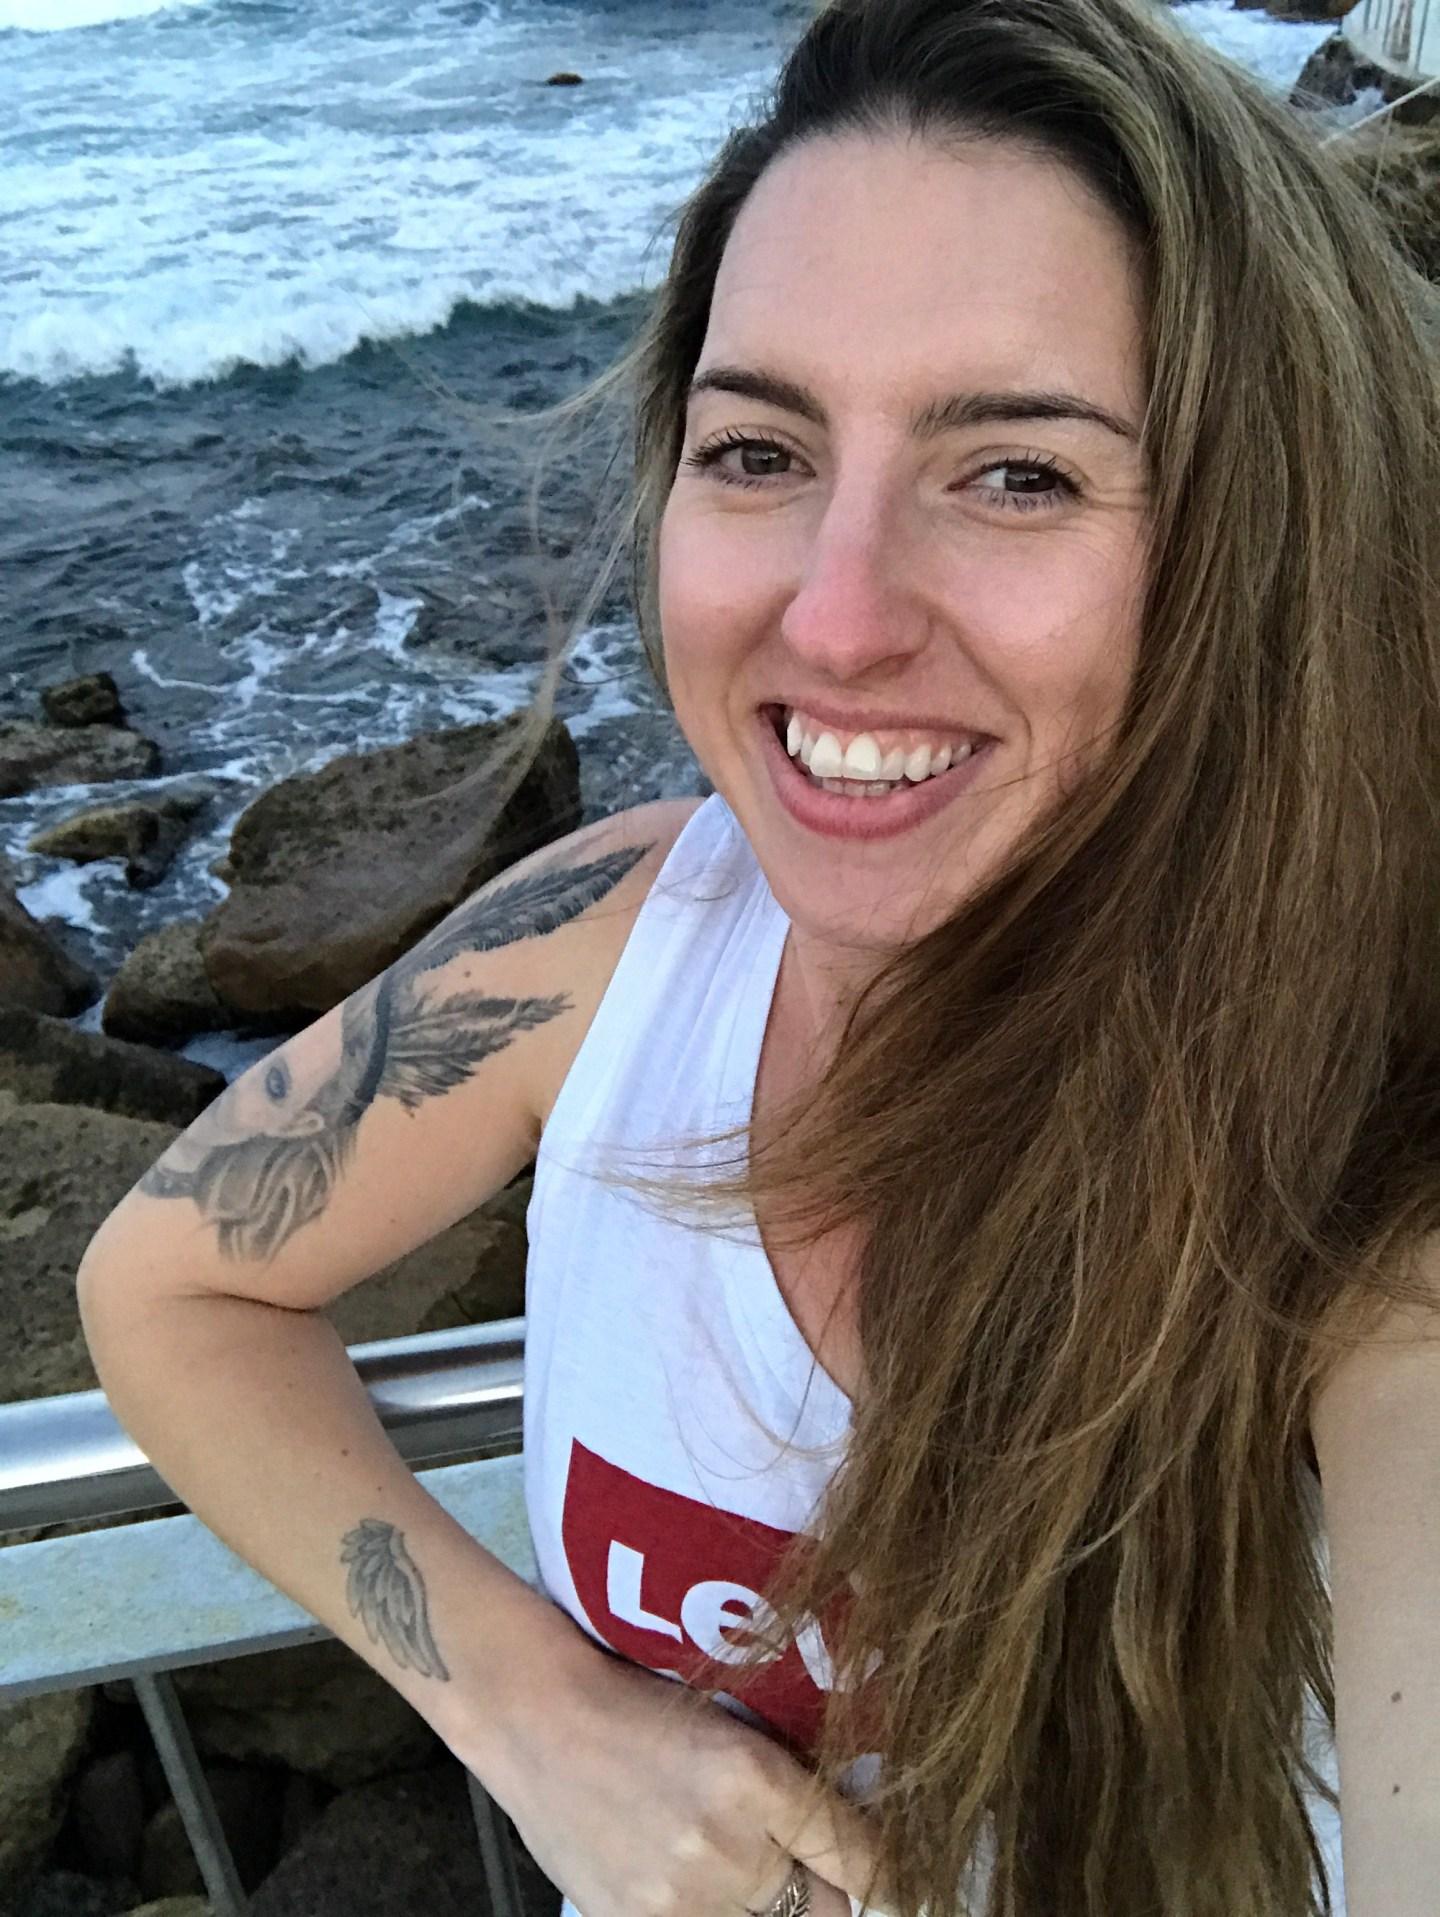 Lara Lain Bronte